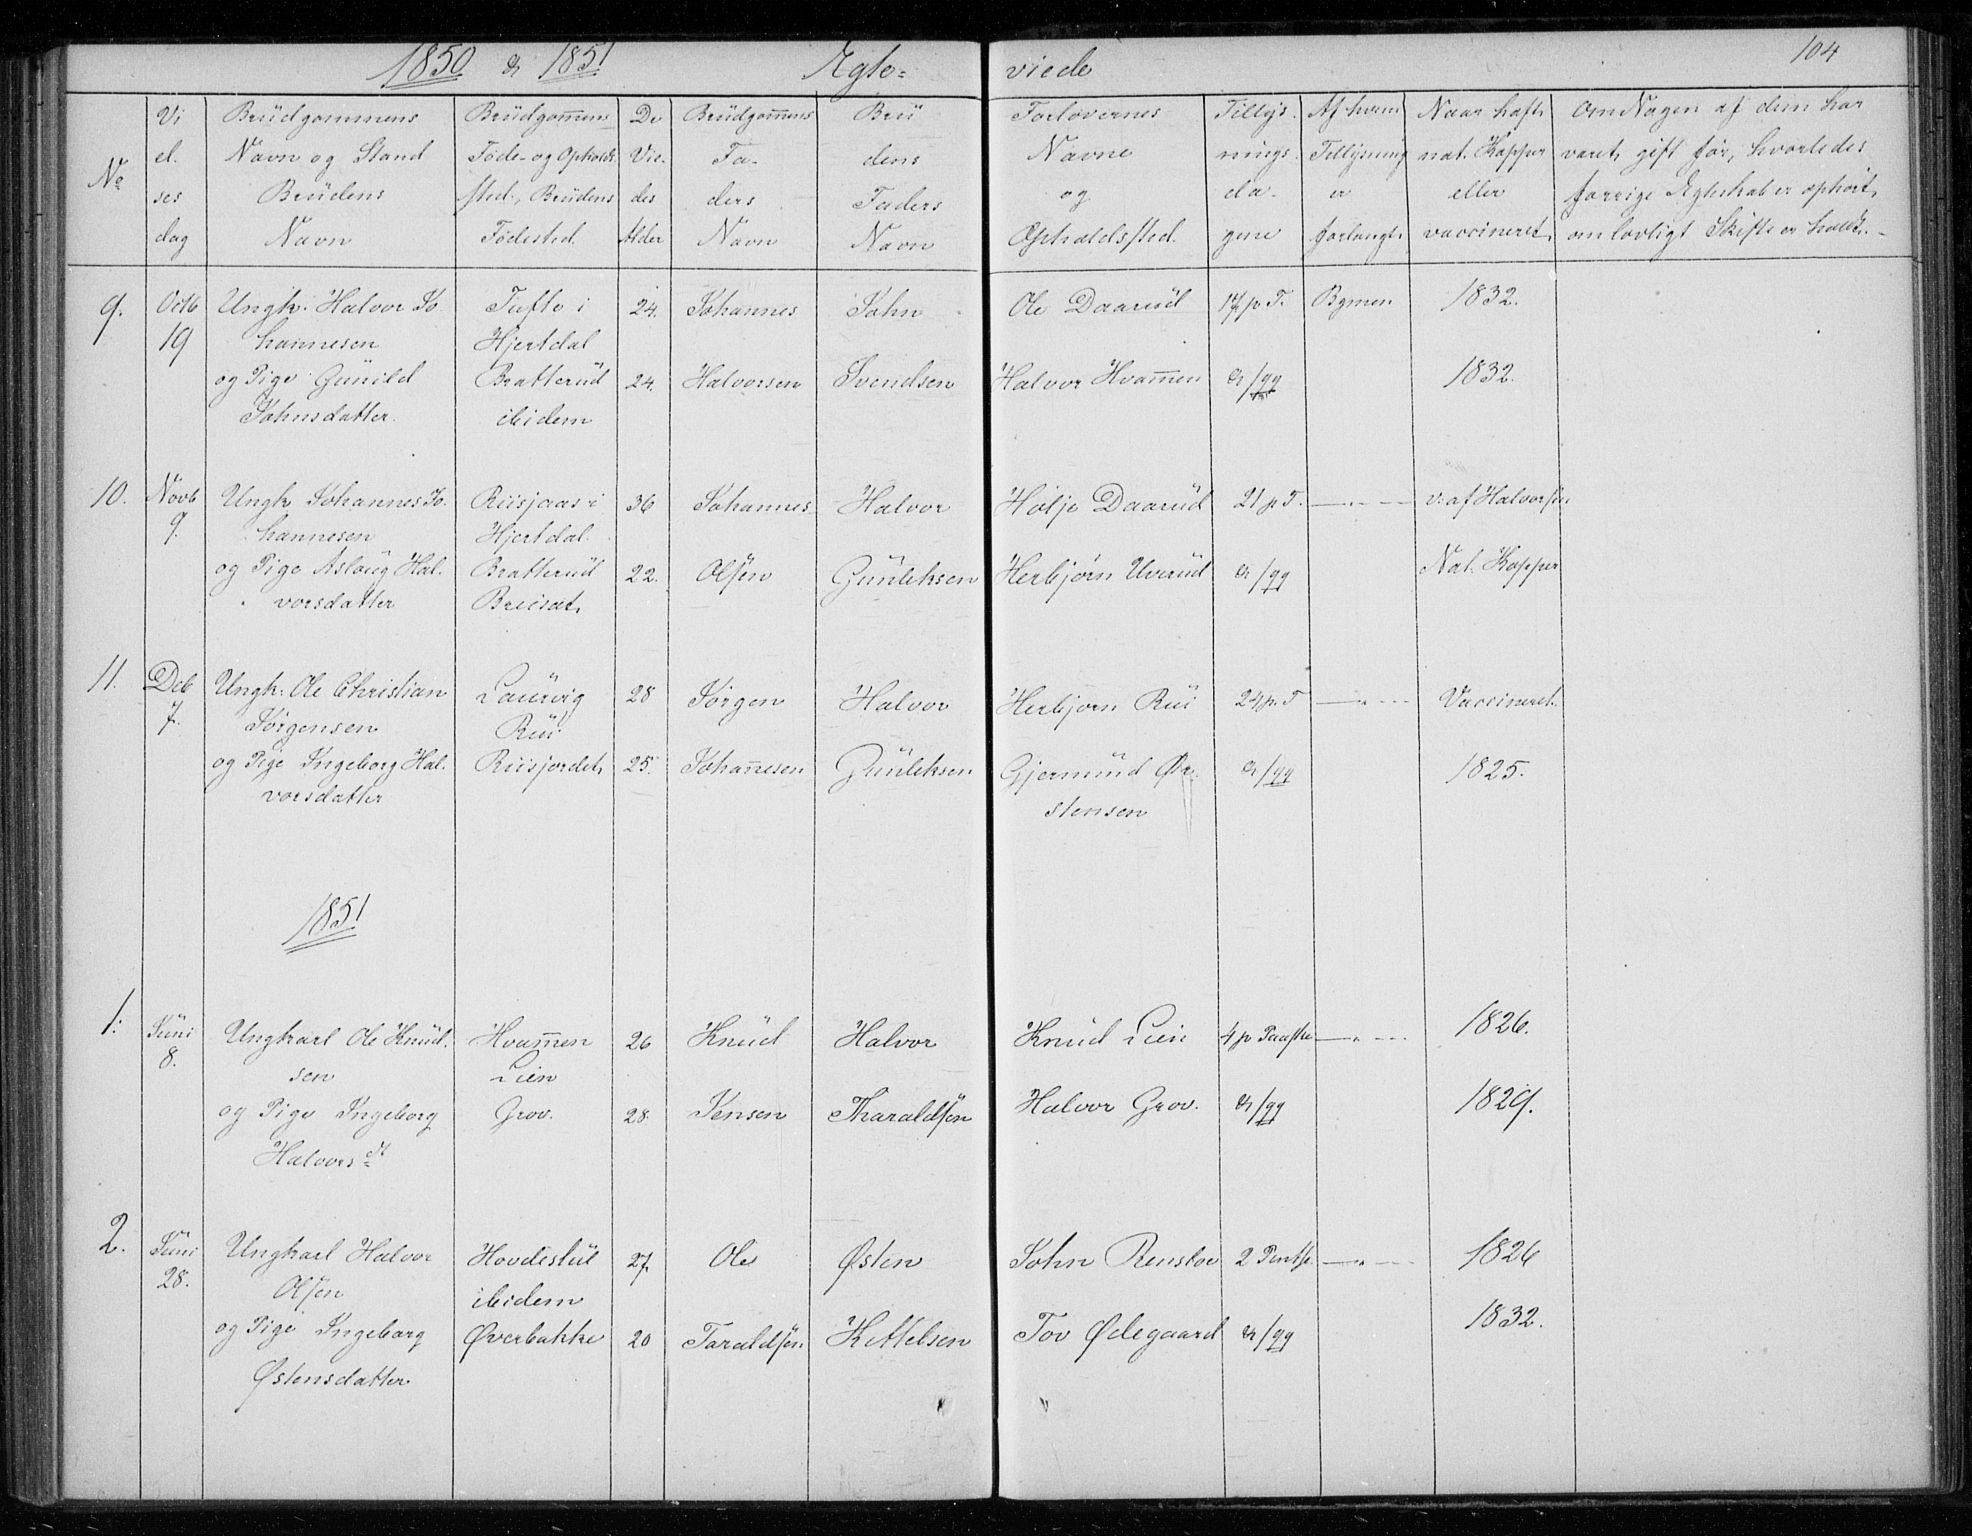 SAKO, Gransherad kirkebøker, F/Fb/L0003: Ministerialbok nr. II 3, 1844-1859, s. 104